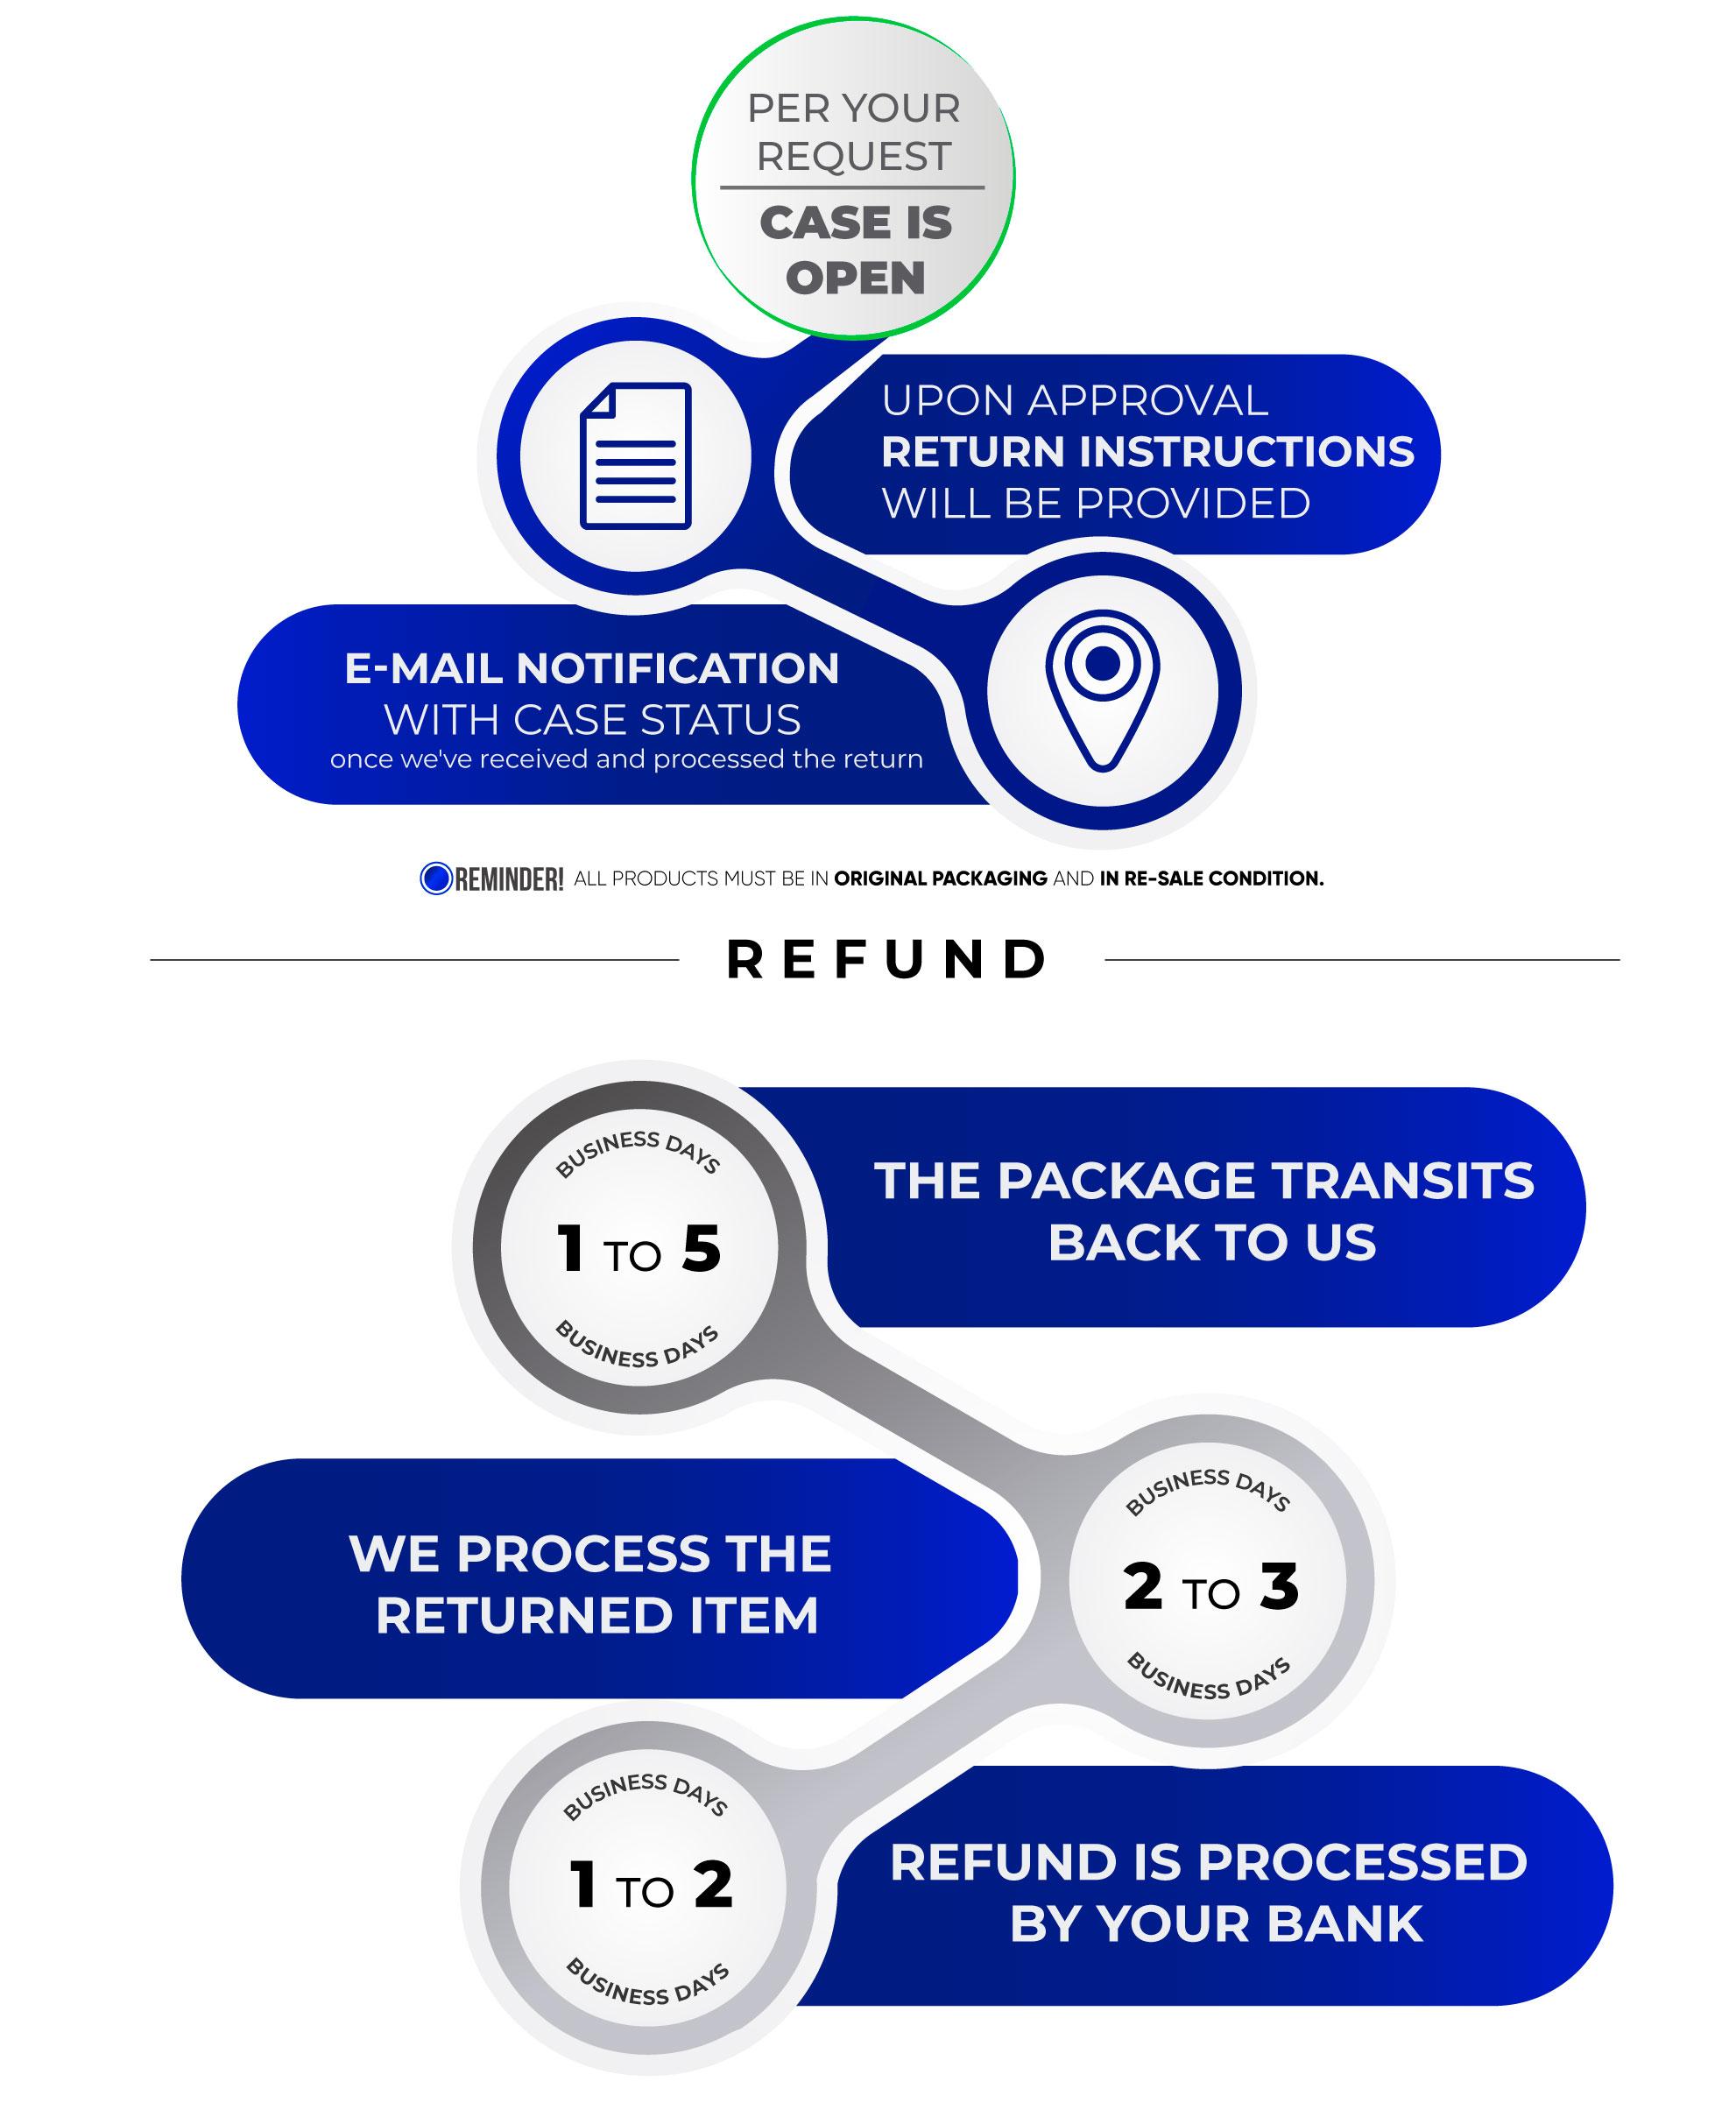 returns-exchange-cancellations-0333.jpg